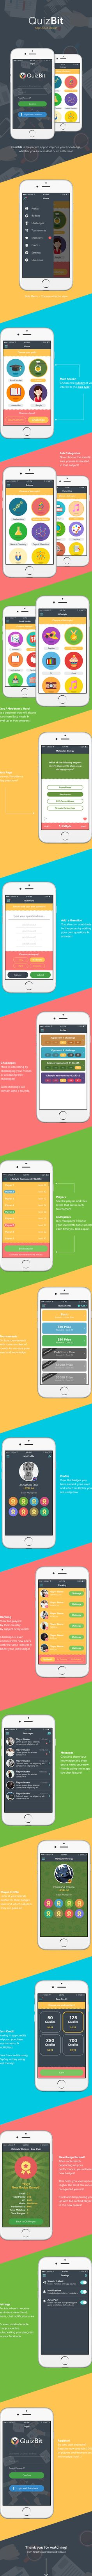 QuizBit | App UI Design on Behance